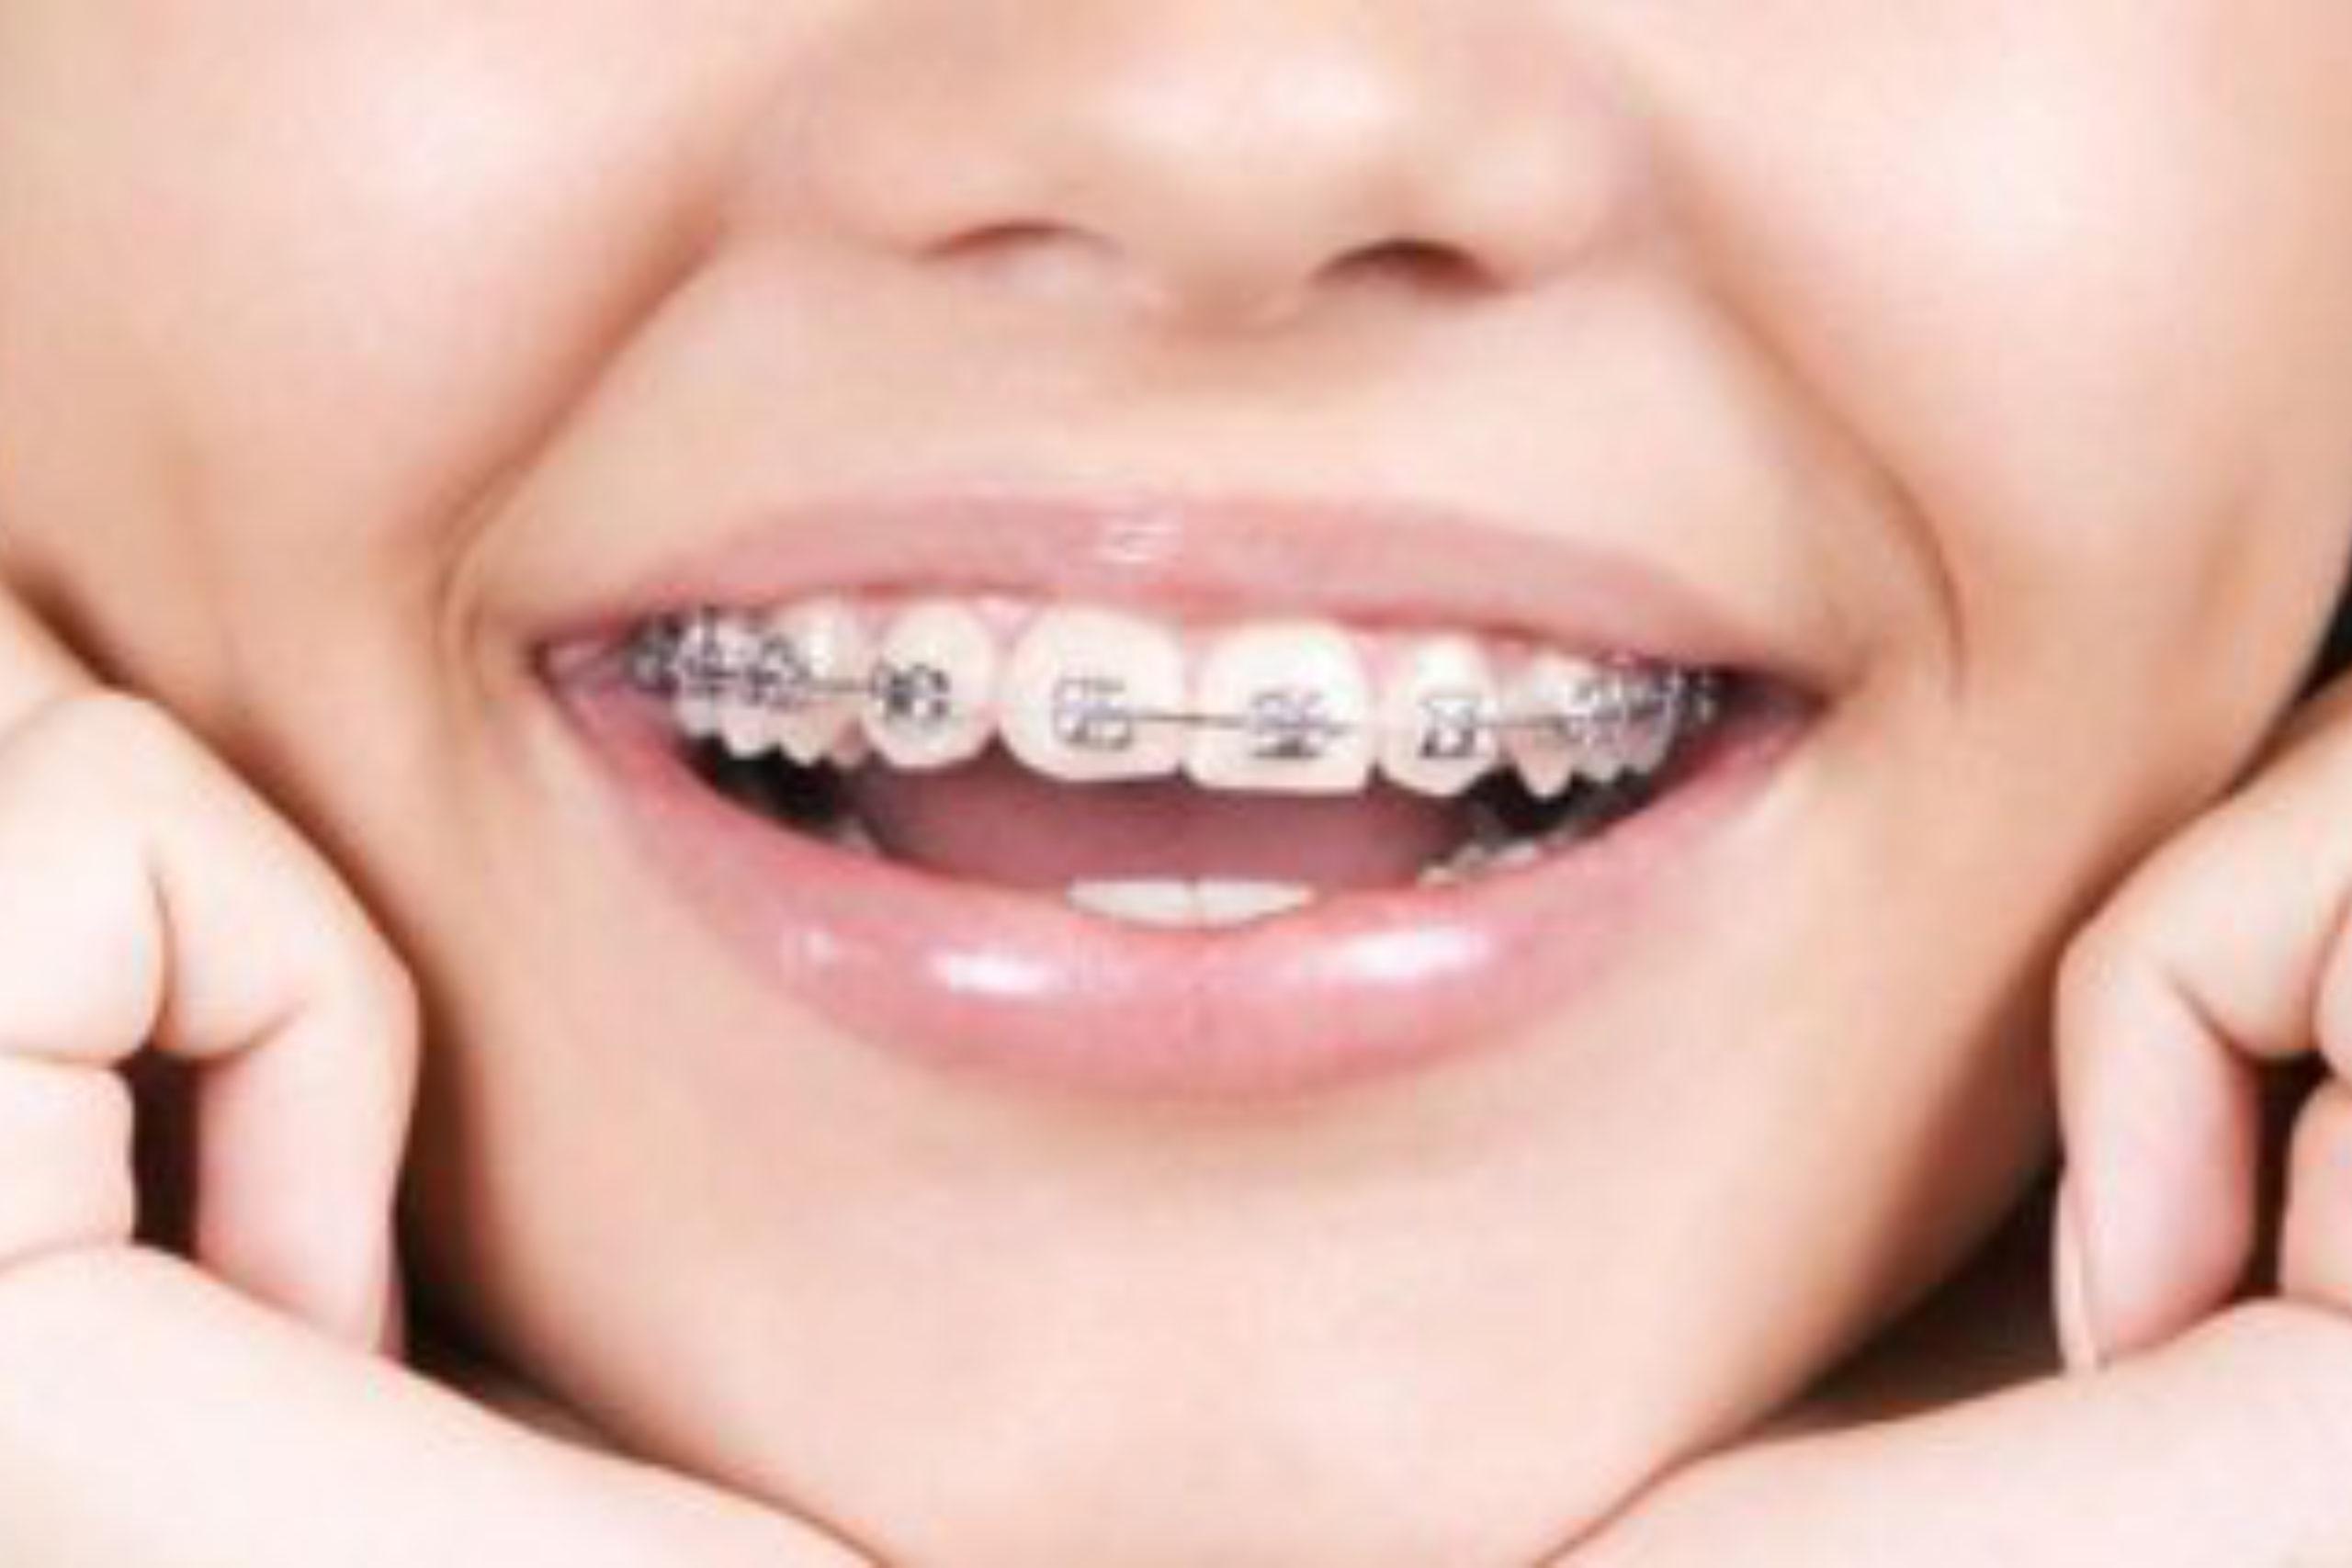 tony weir orthodontist brisbane braces